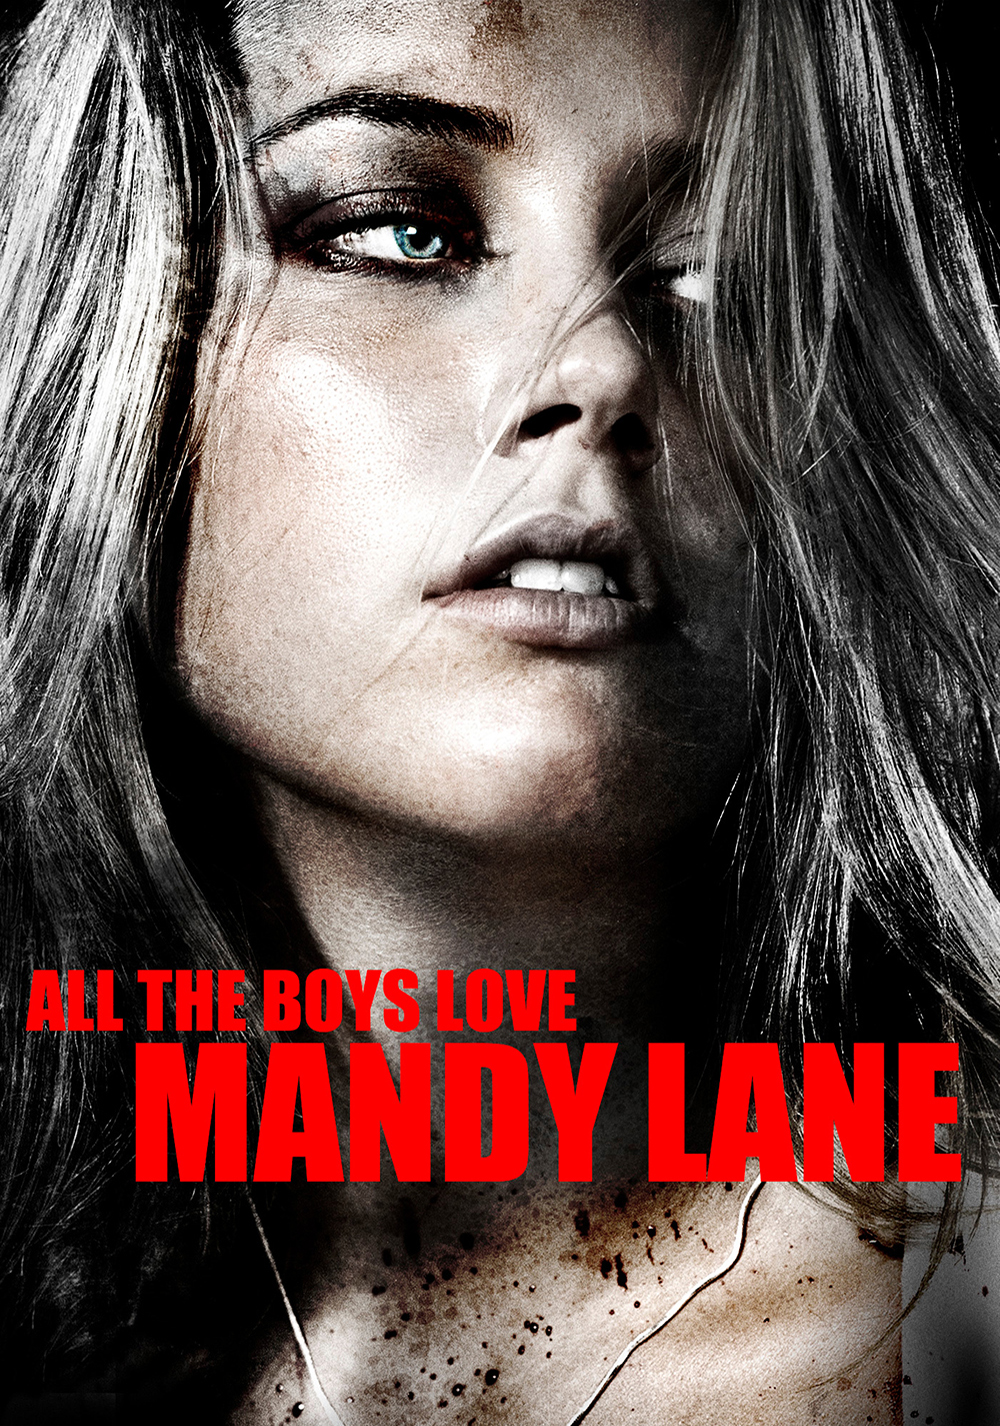 All The Boys Love Mandy Lane Besetzung